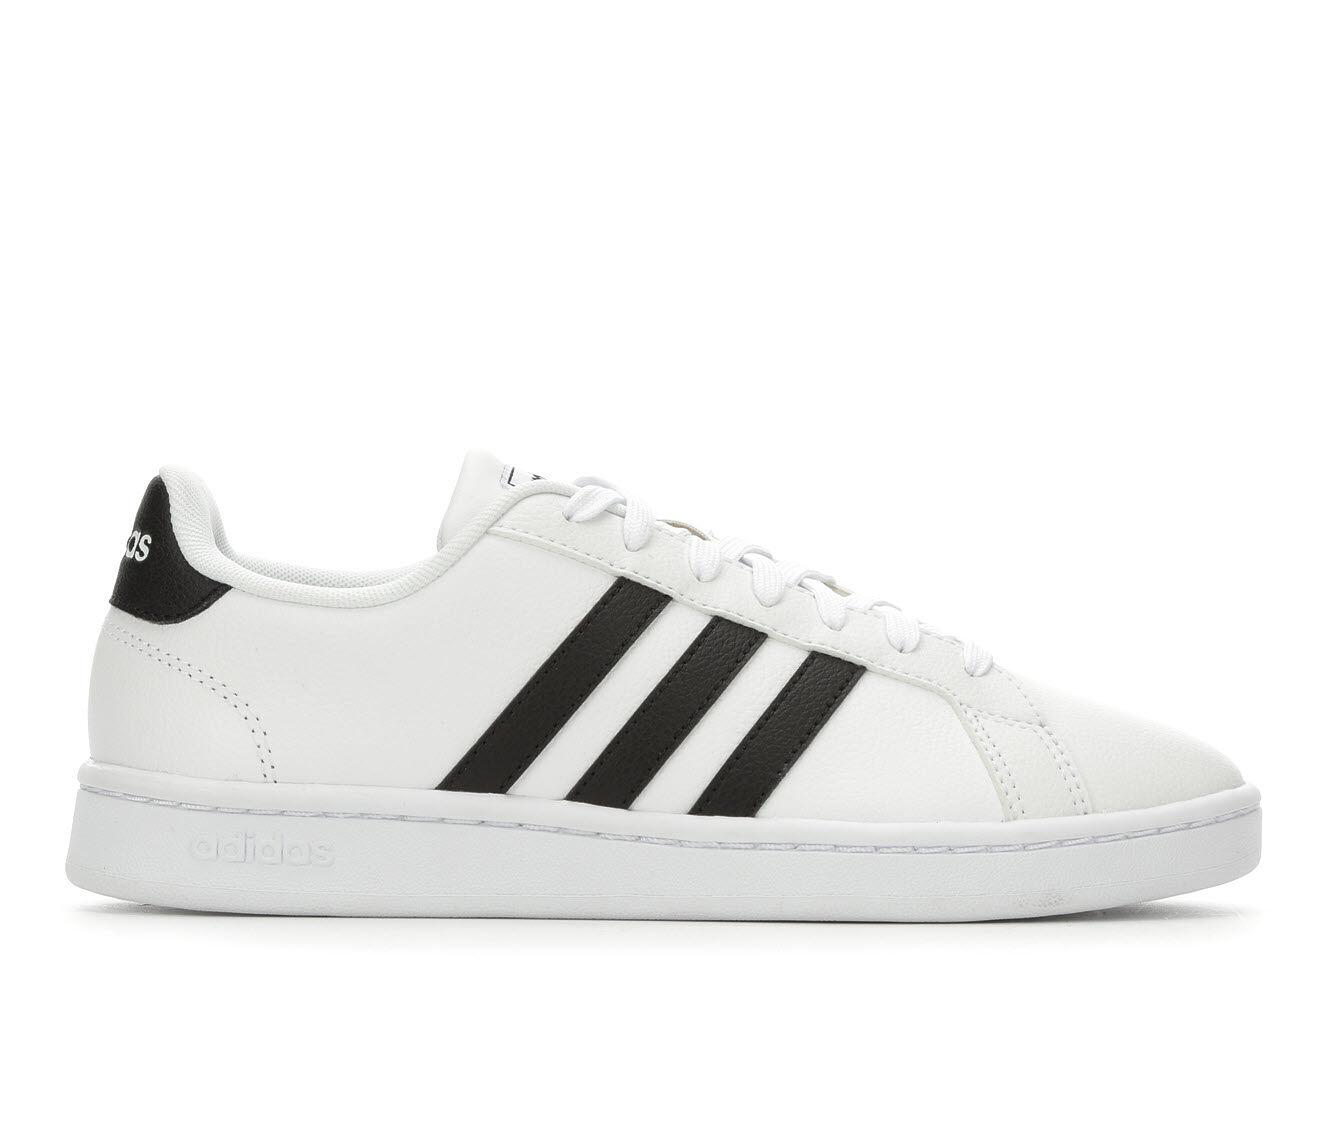 Women's Adidas Grand Court Basketball Shoes White/Black